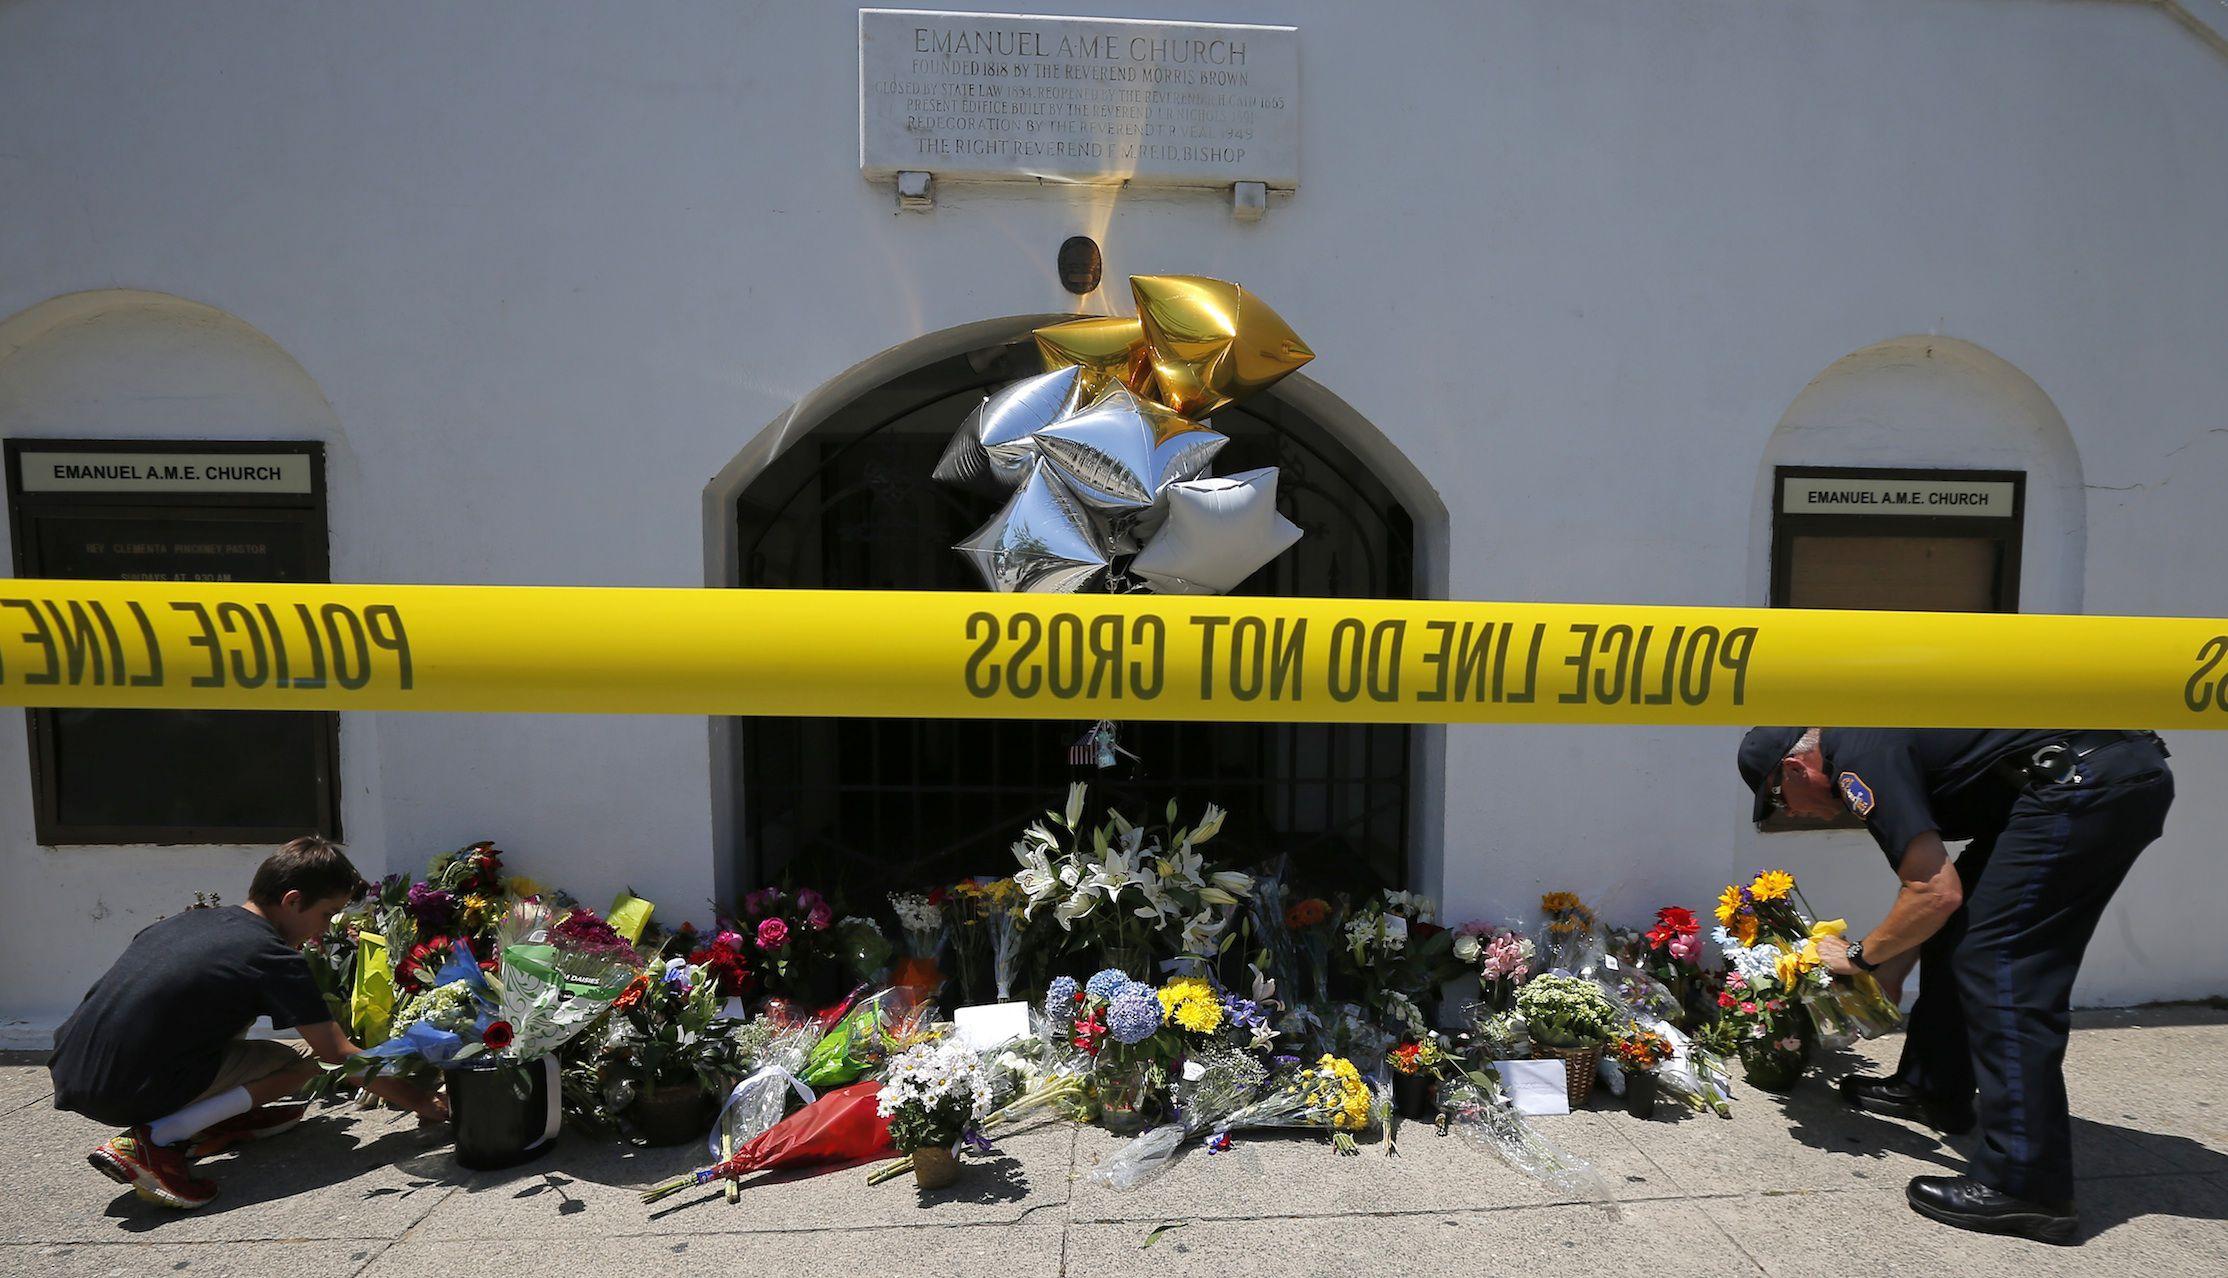 A memorial outside Emanuel African Methodist Episcopal Church in Charleston, South Carolina.